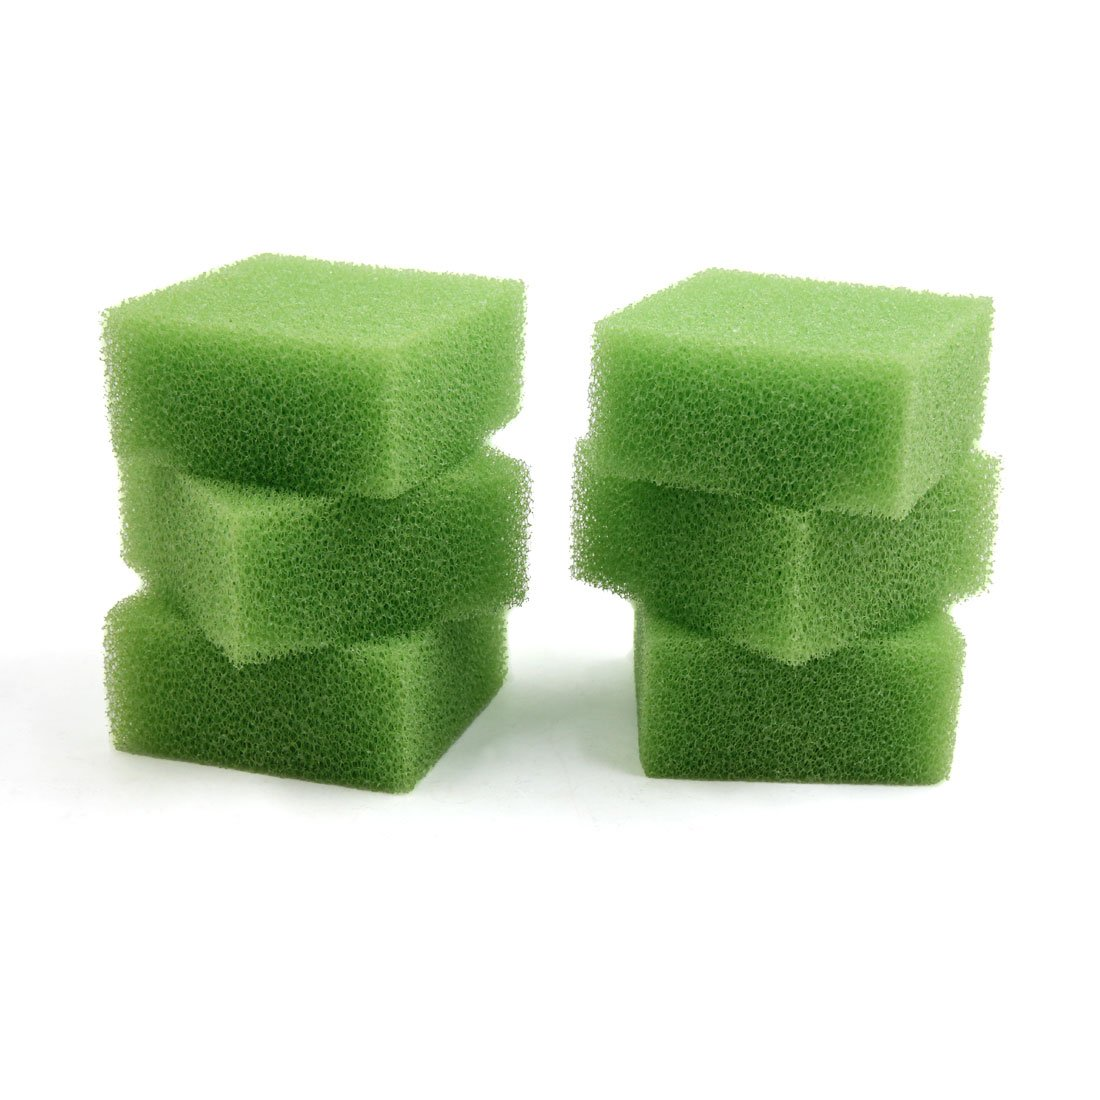 Uxcell 6 Pcs 3.74x3.74x1.77 inch Green Filter Cartridge Sponge Replacement for Aquarium